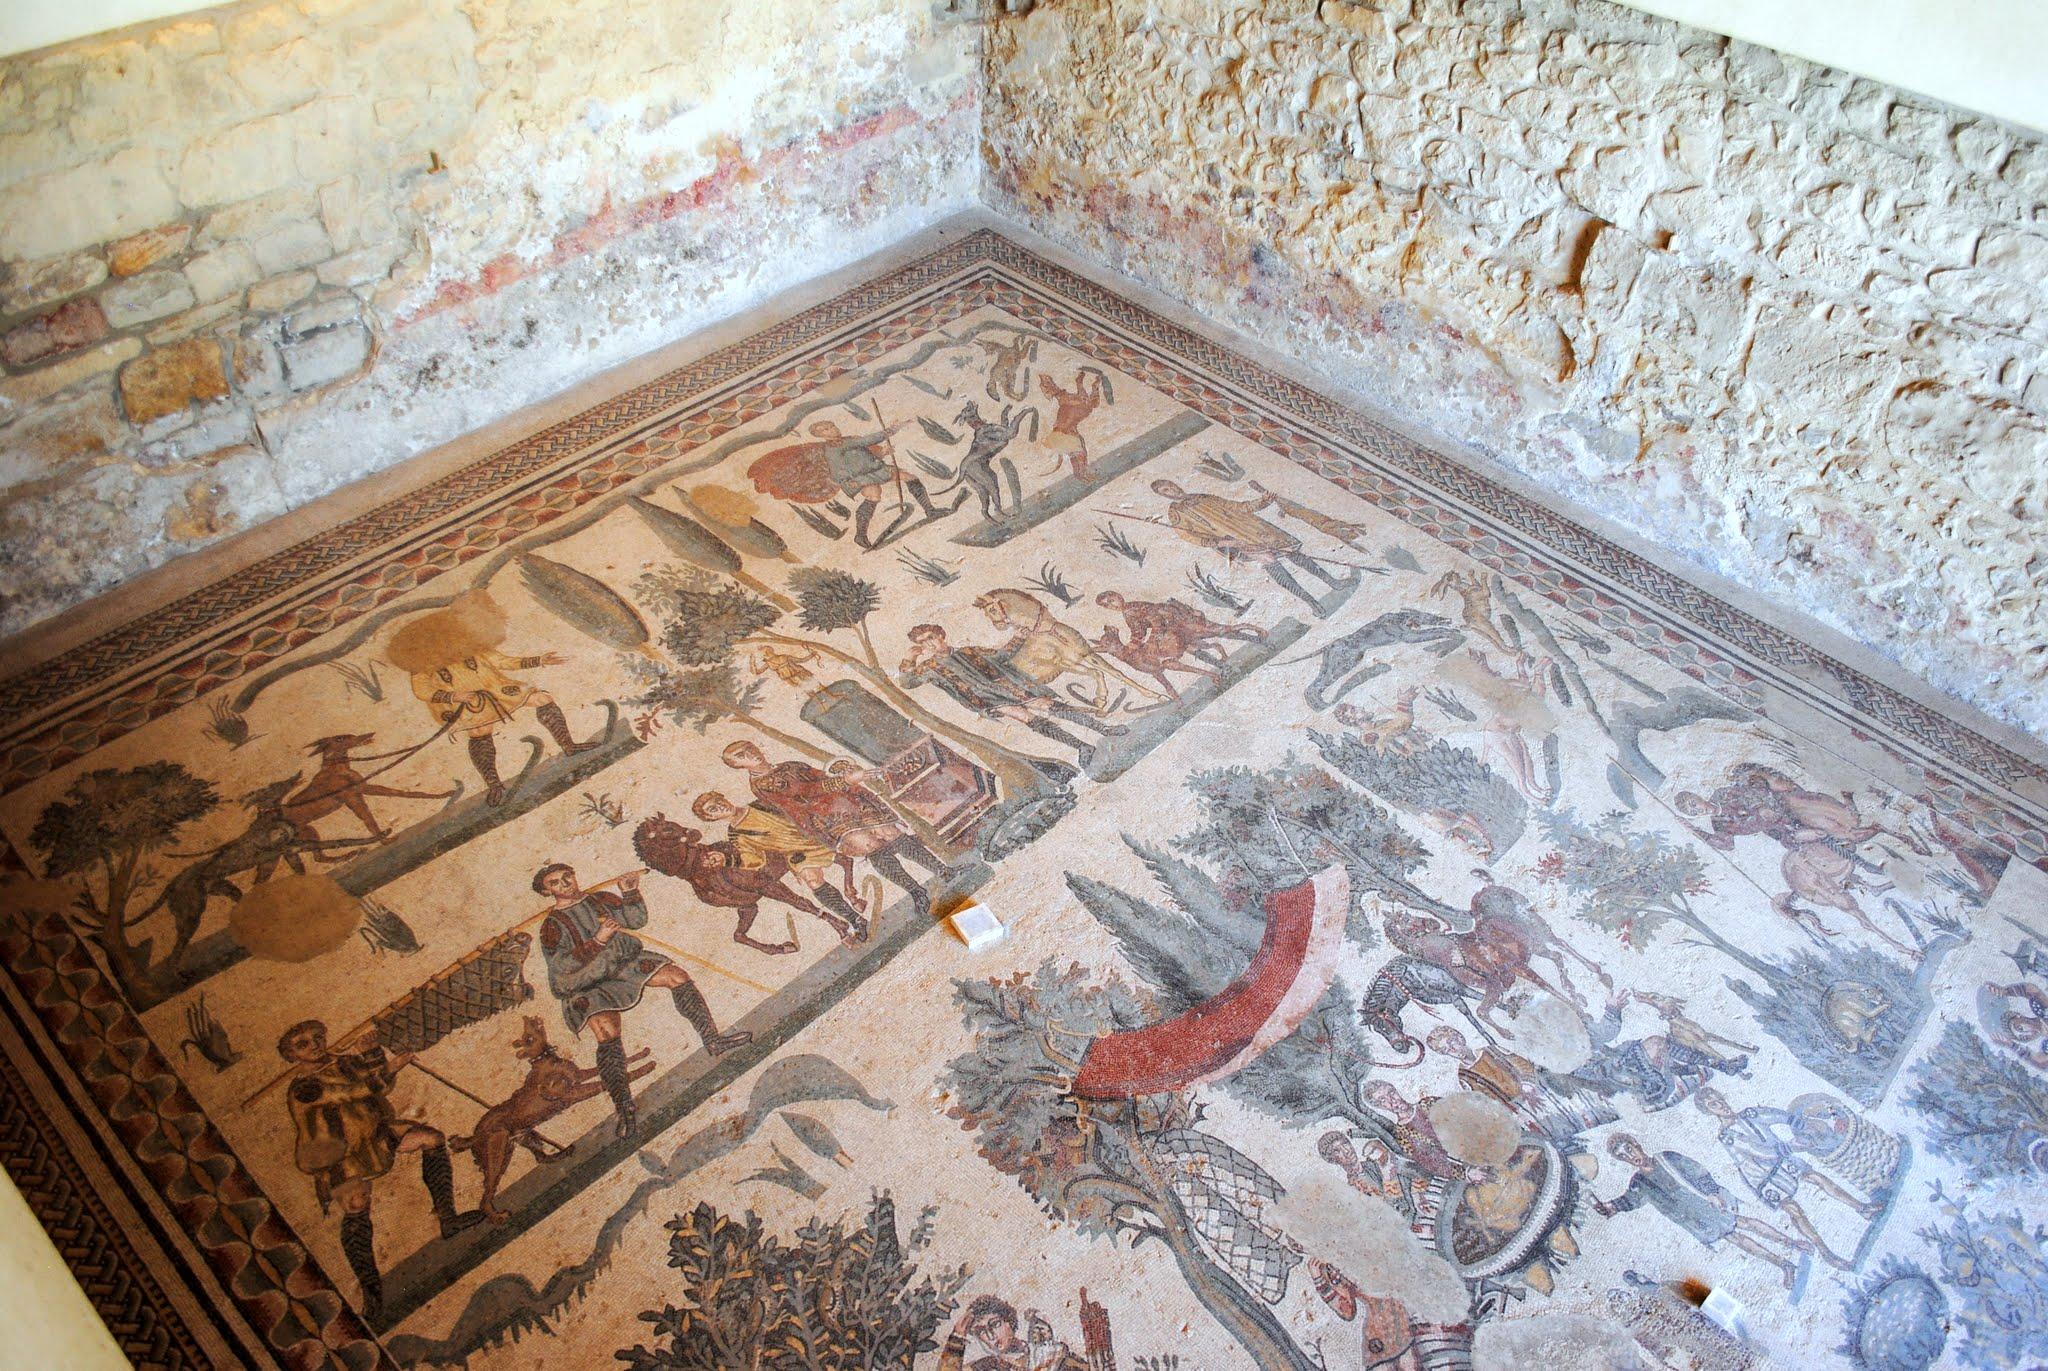 My Photos: Italy -- Mosaics -- Sicily -- Piazza Armerina -- The Room of the Little Hunt Mosaic